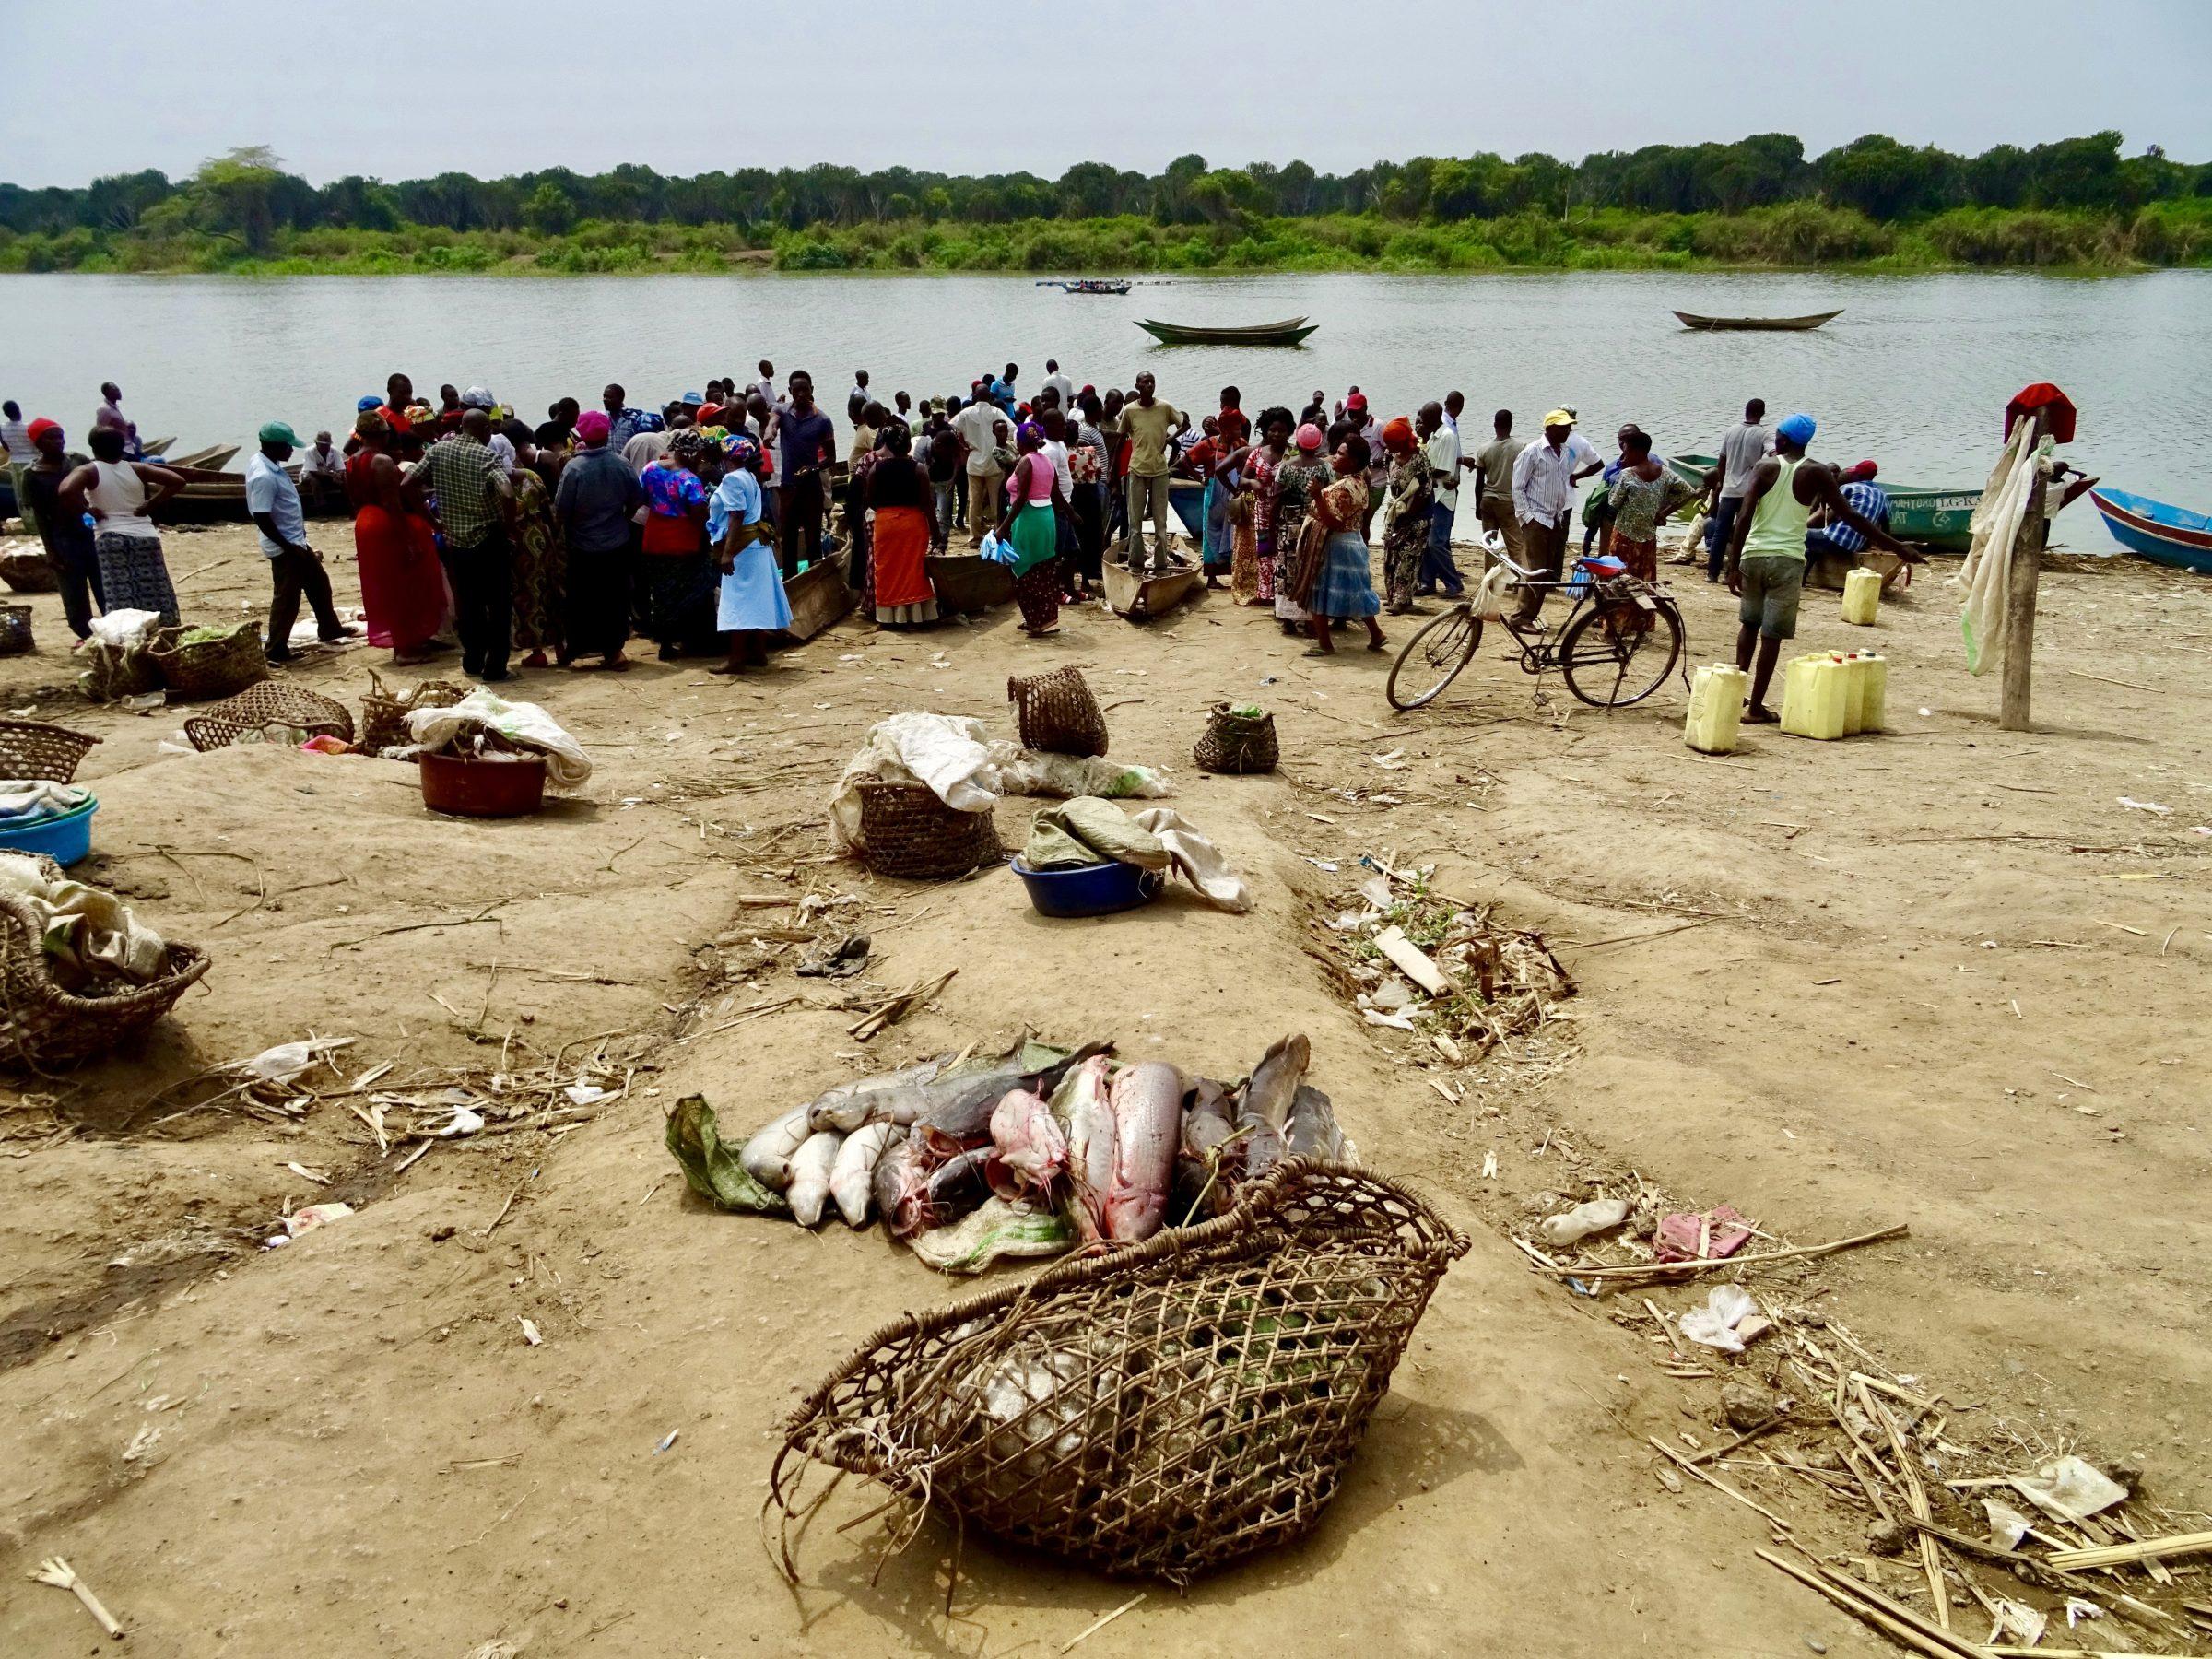 Manden met vis op de markt in Hamukungu, Lake George